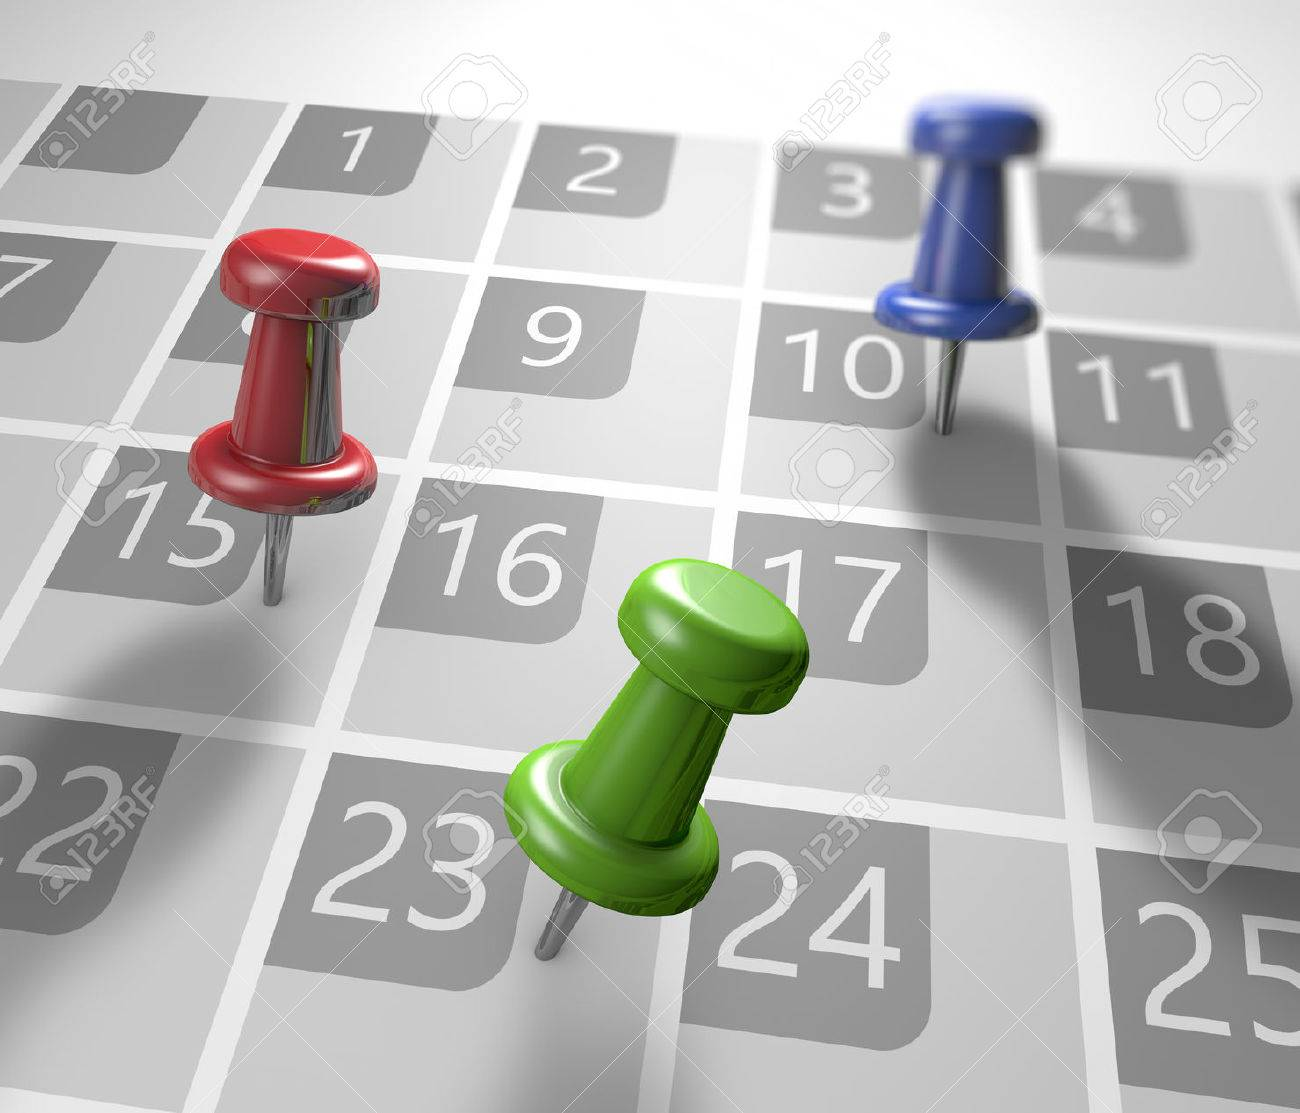 Calendar with thumbtacks as a concept of events - 29601598